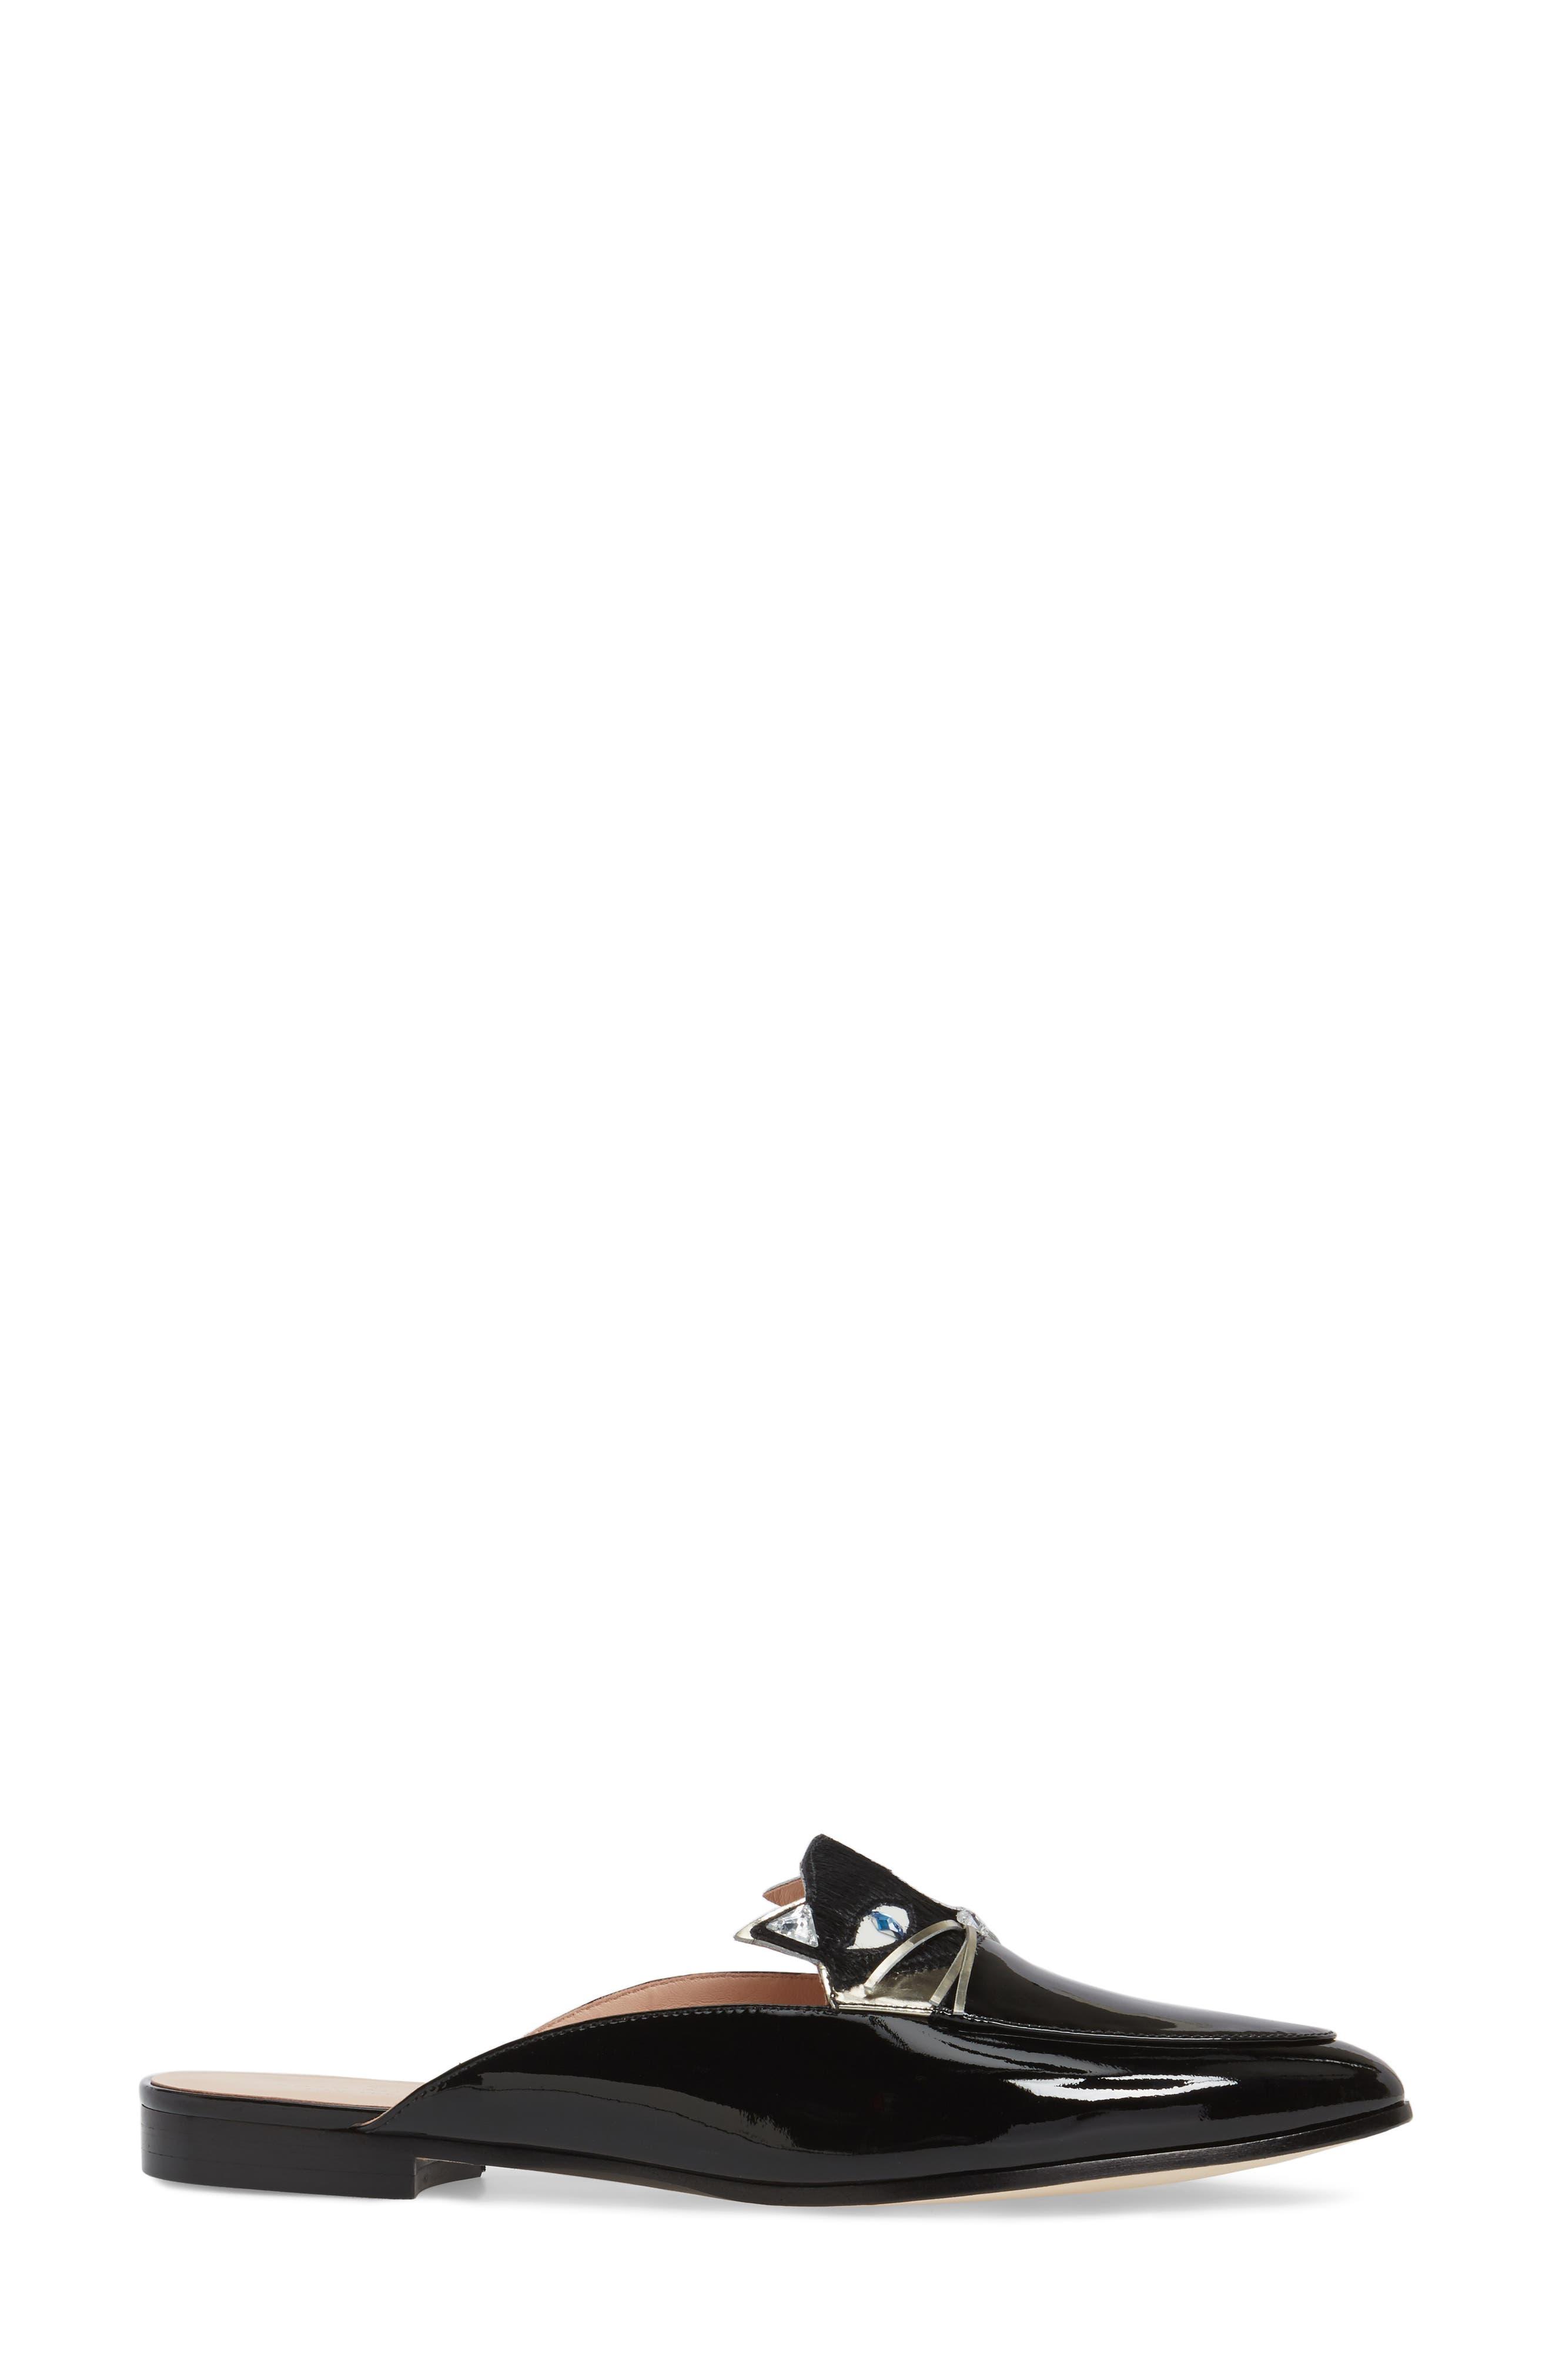 casper mule loafer,                             Alternate thumbnail 3, color,                             Black Patent